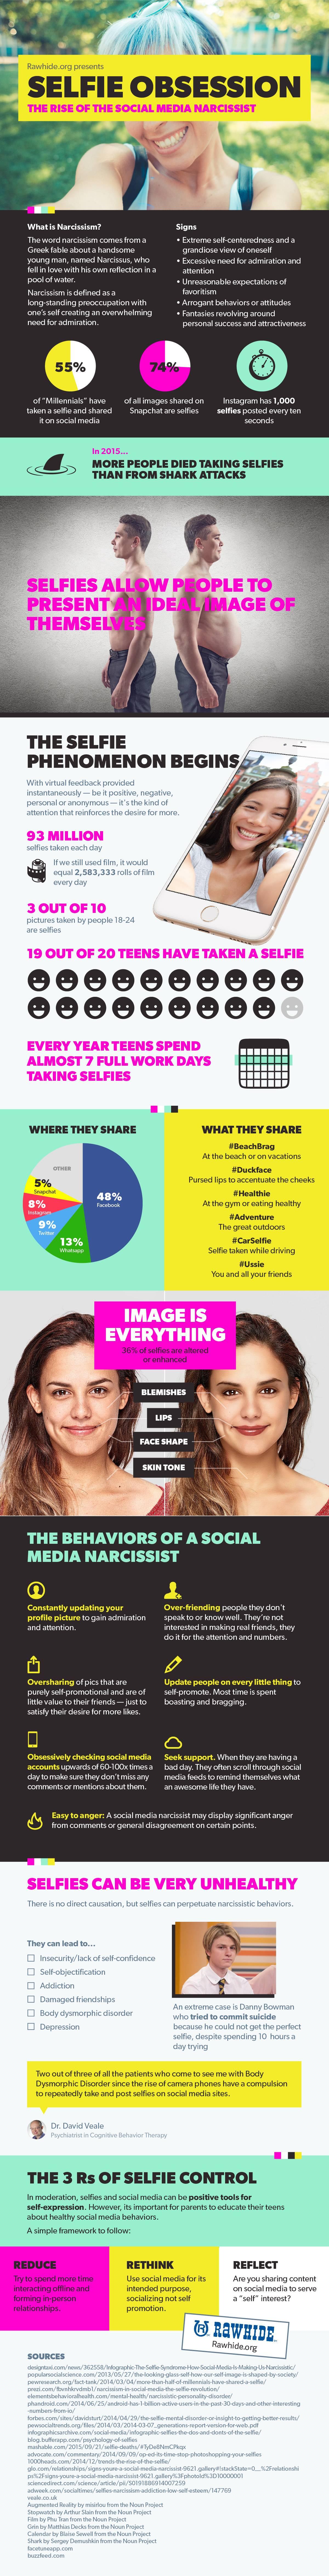 infografia-selfie-narcisismo